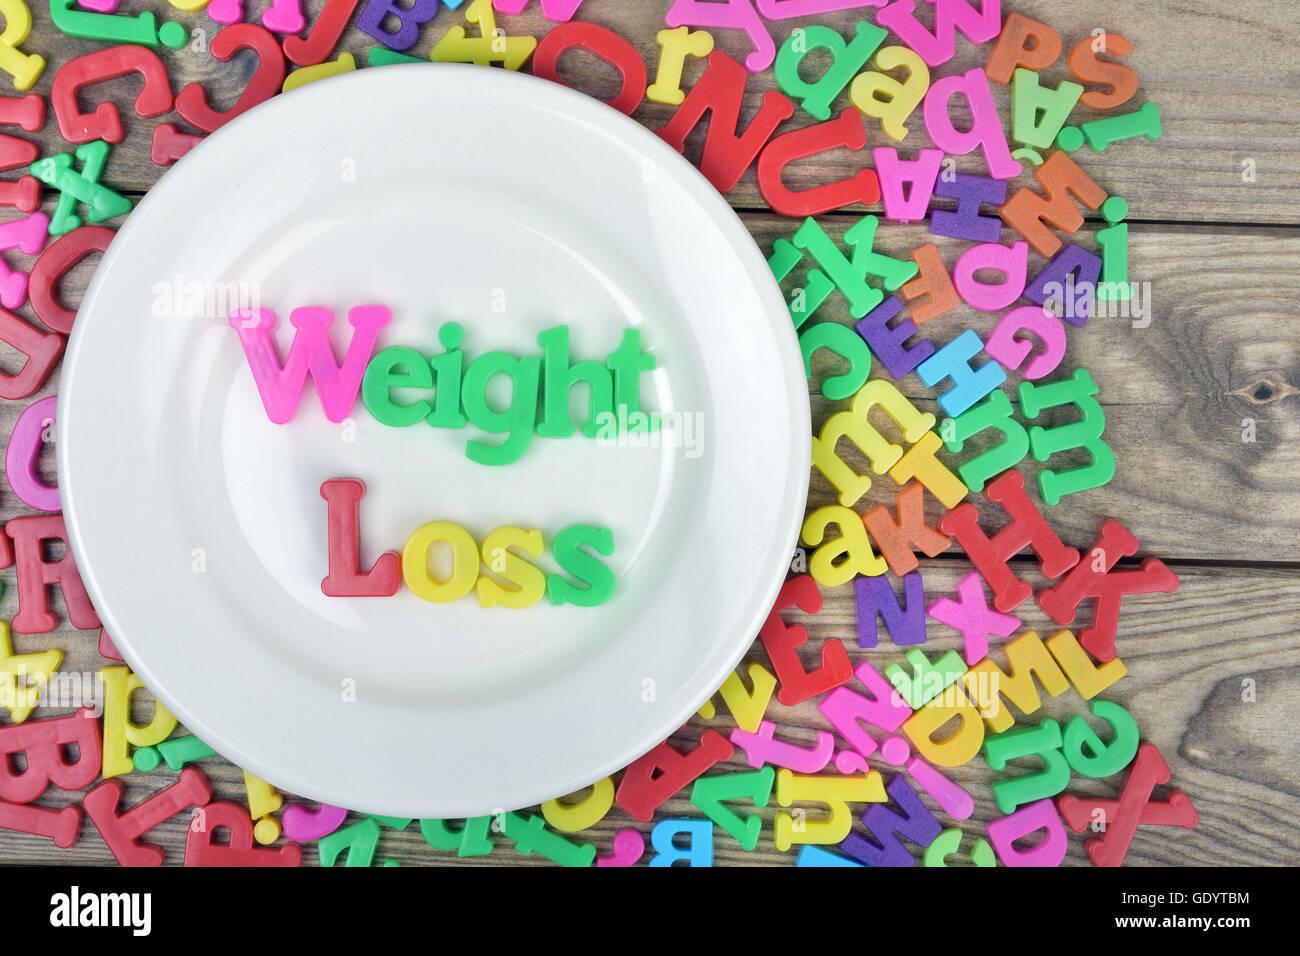 Idea Word On White Plate Stockfotos & Idea Word On White Plate ...